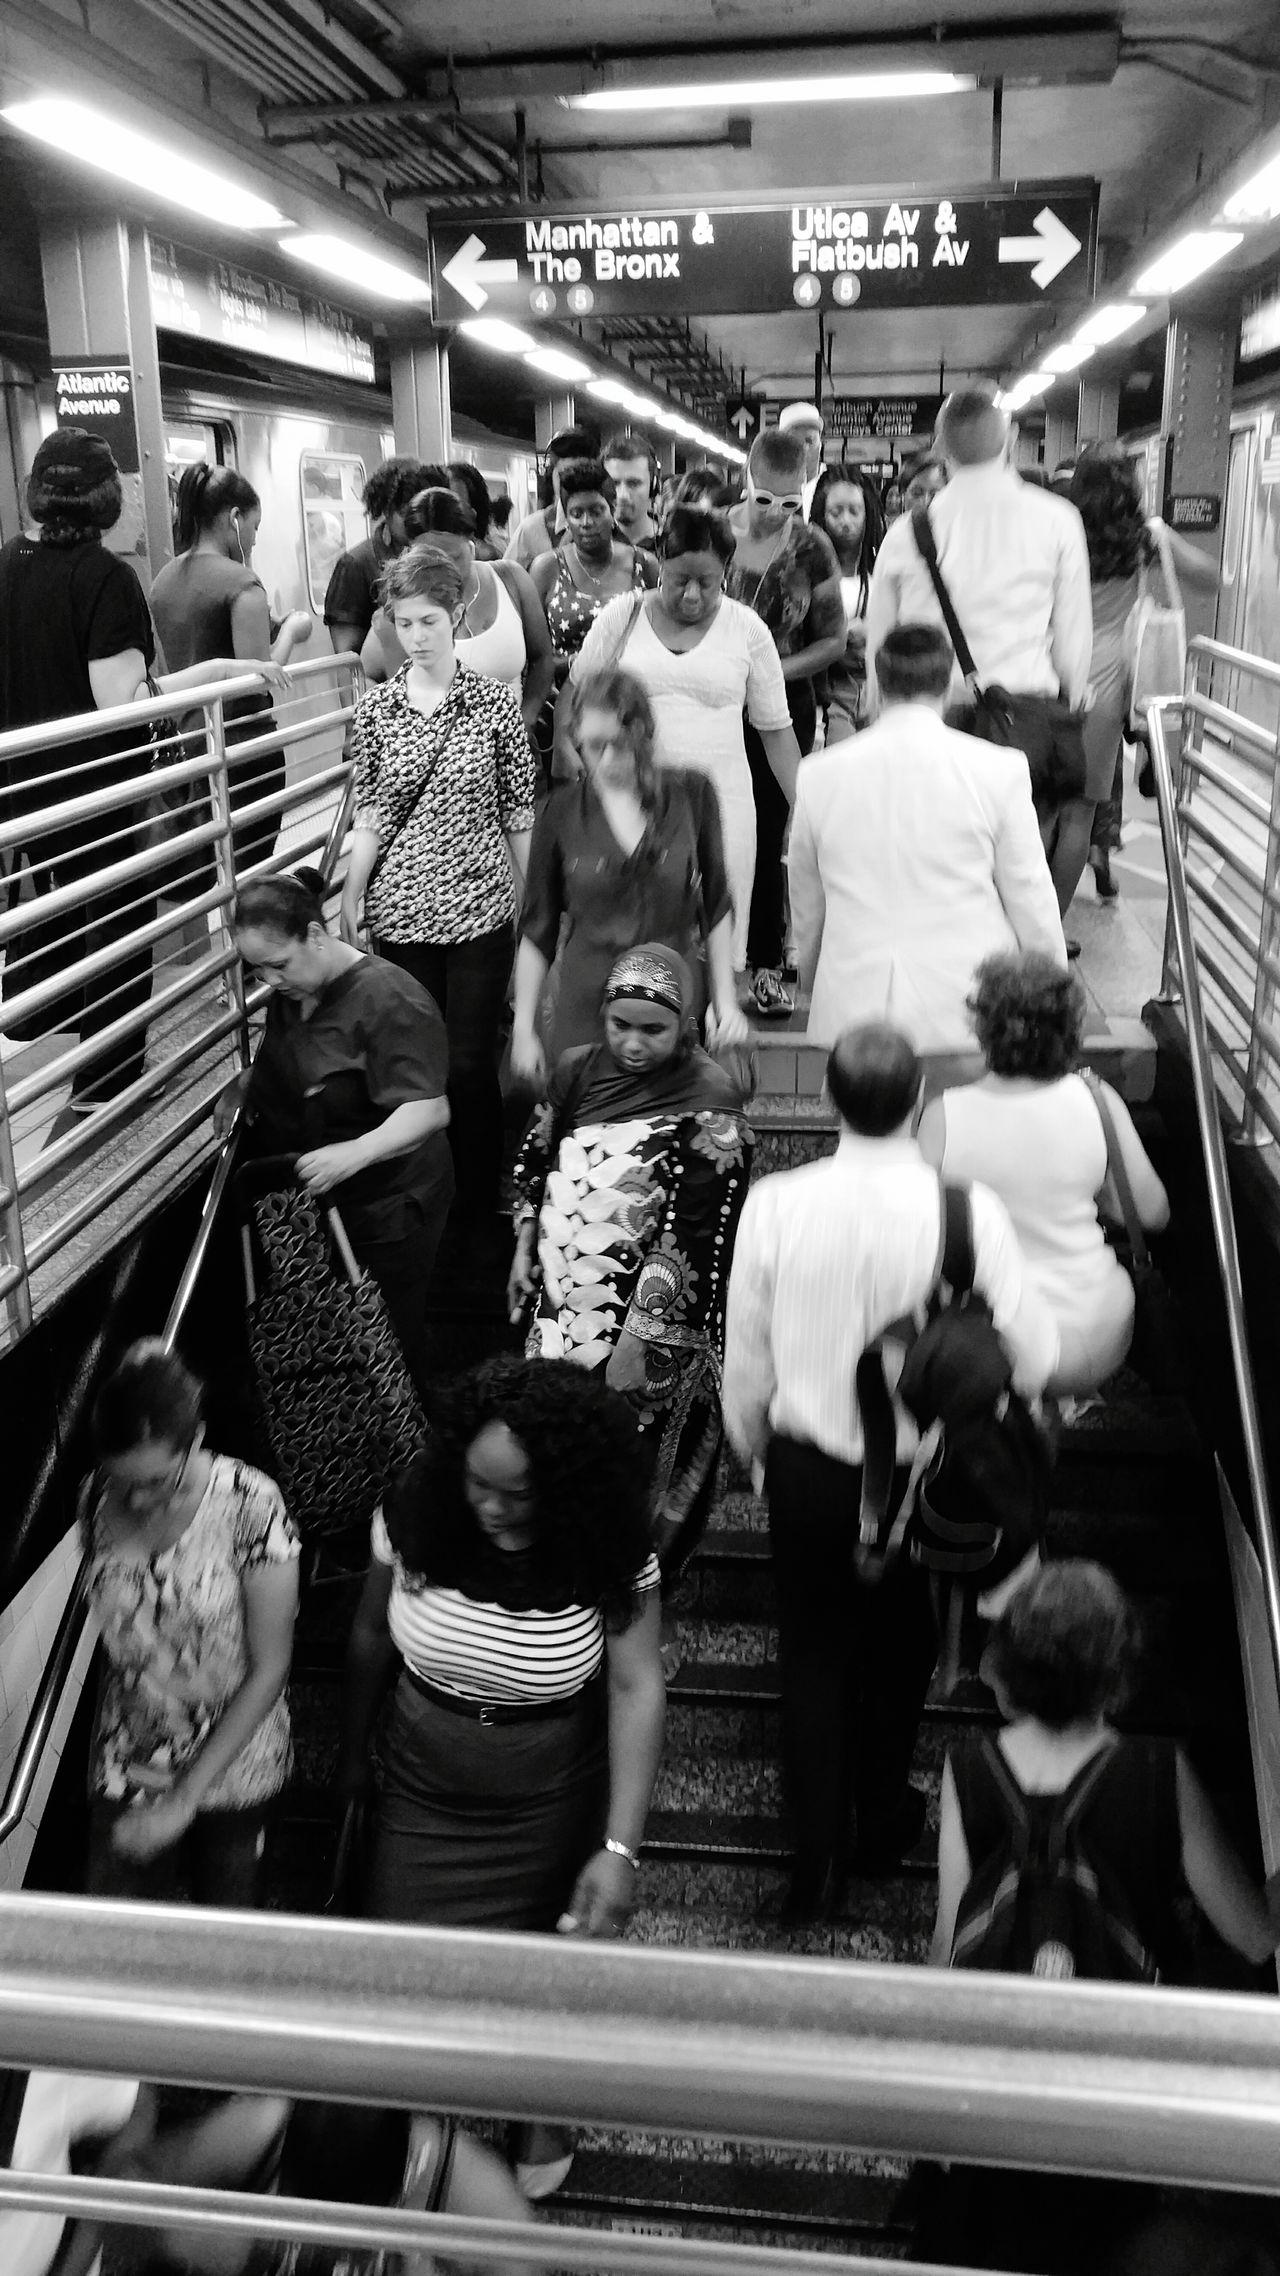 City Life Rush Hour 4 Train People Atlantic Terminal Still Life People Photography